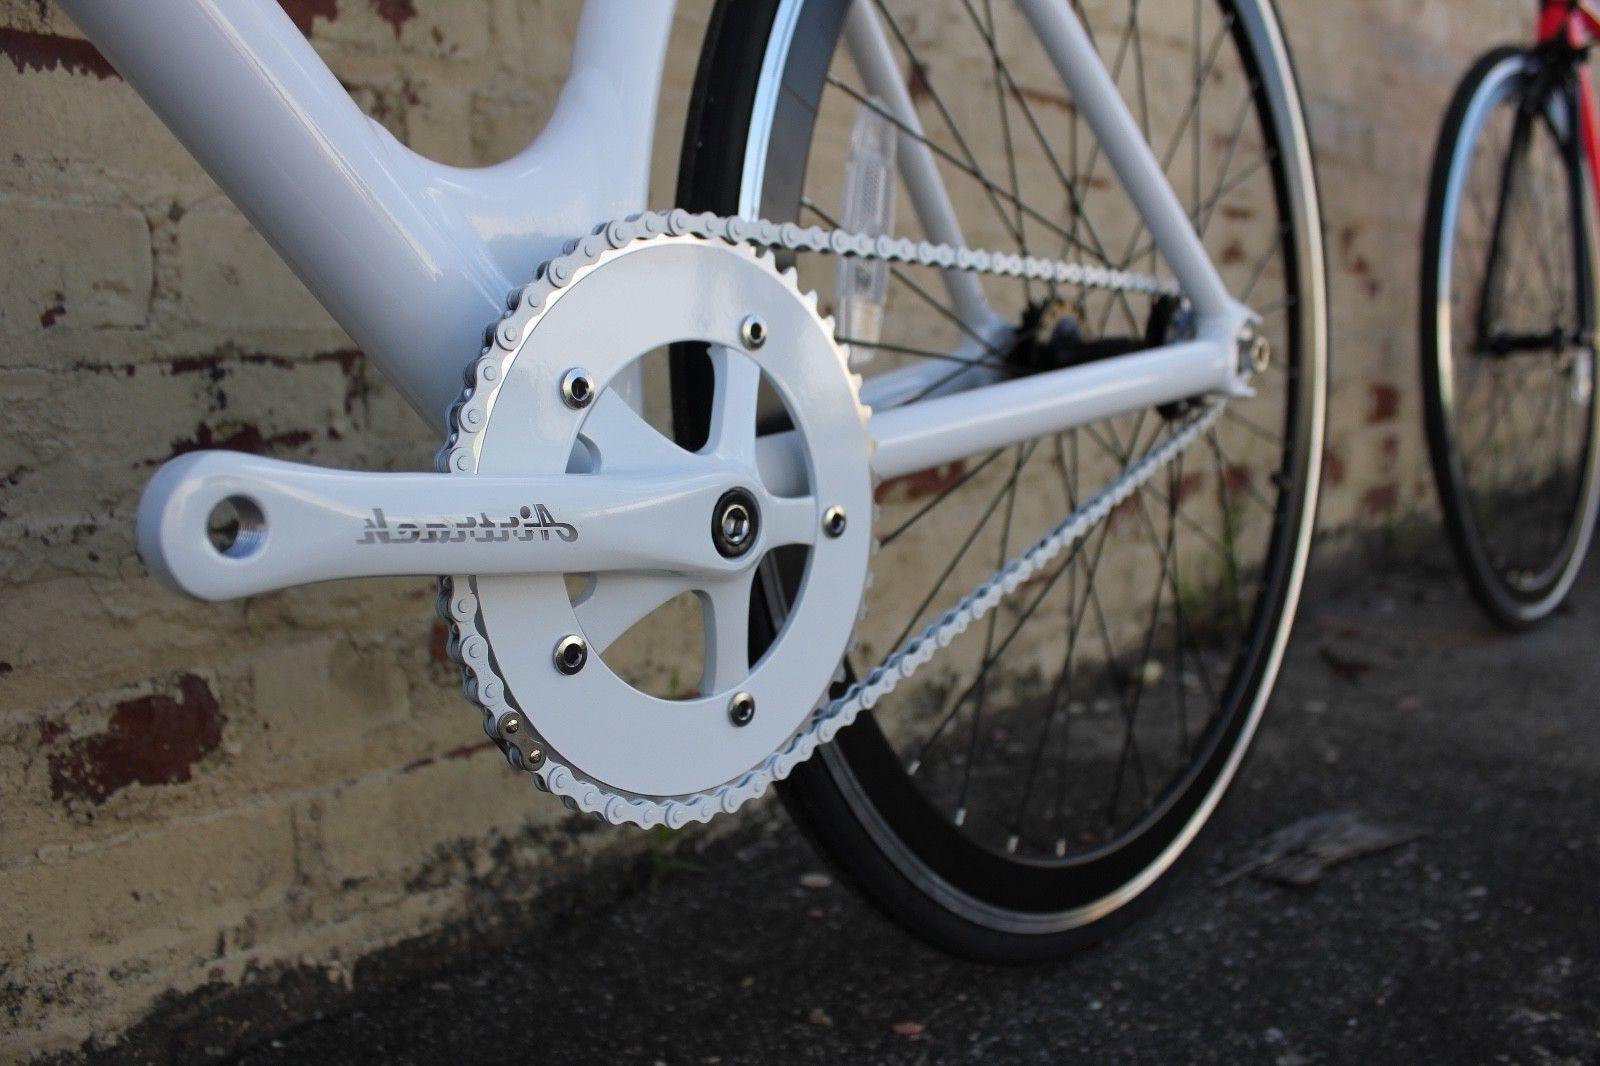 Airtrack Bike Bicycle Gear Fixie cm